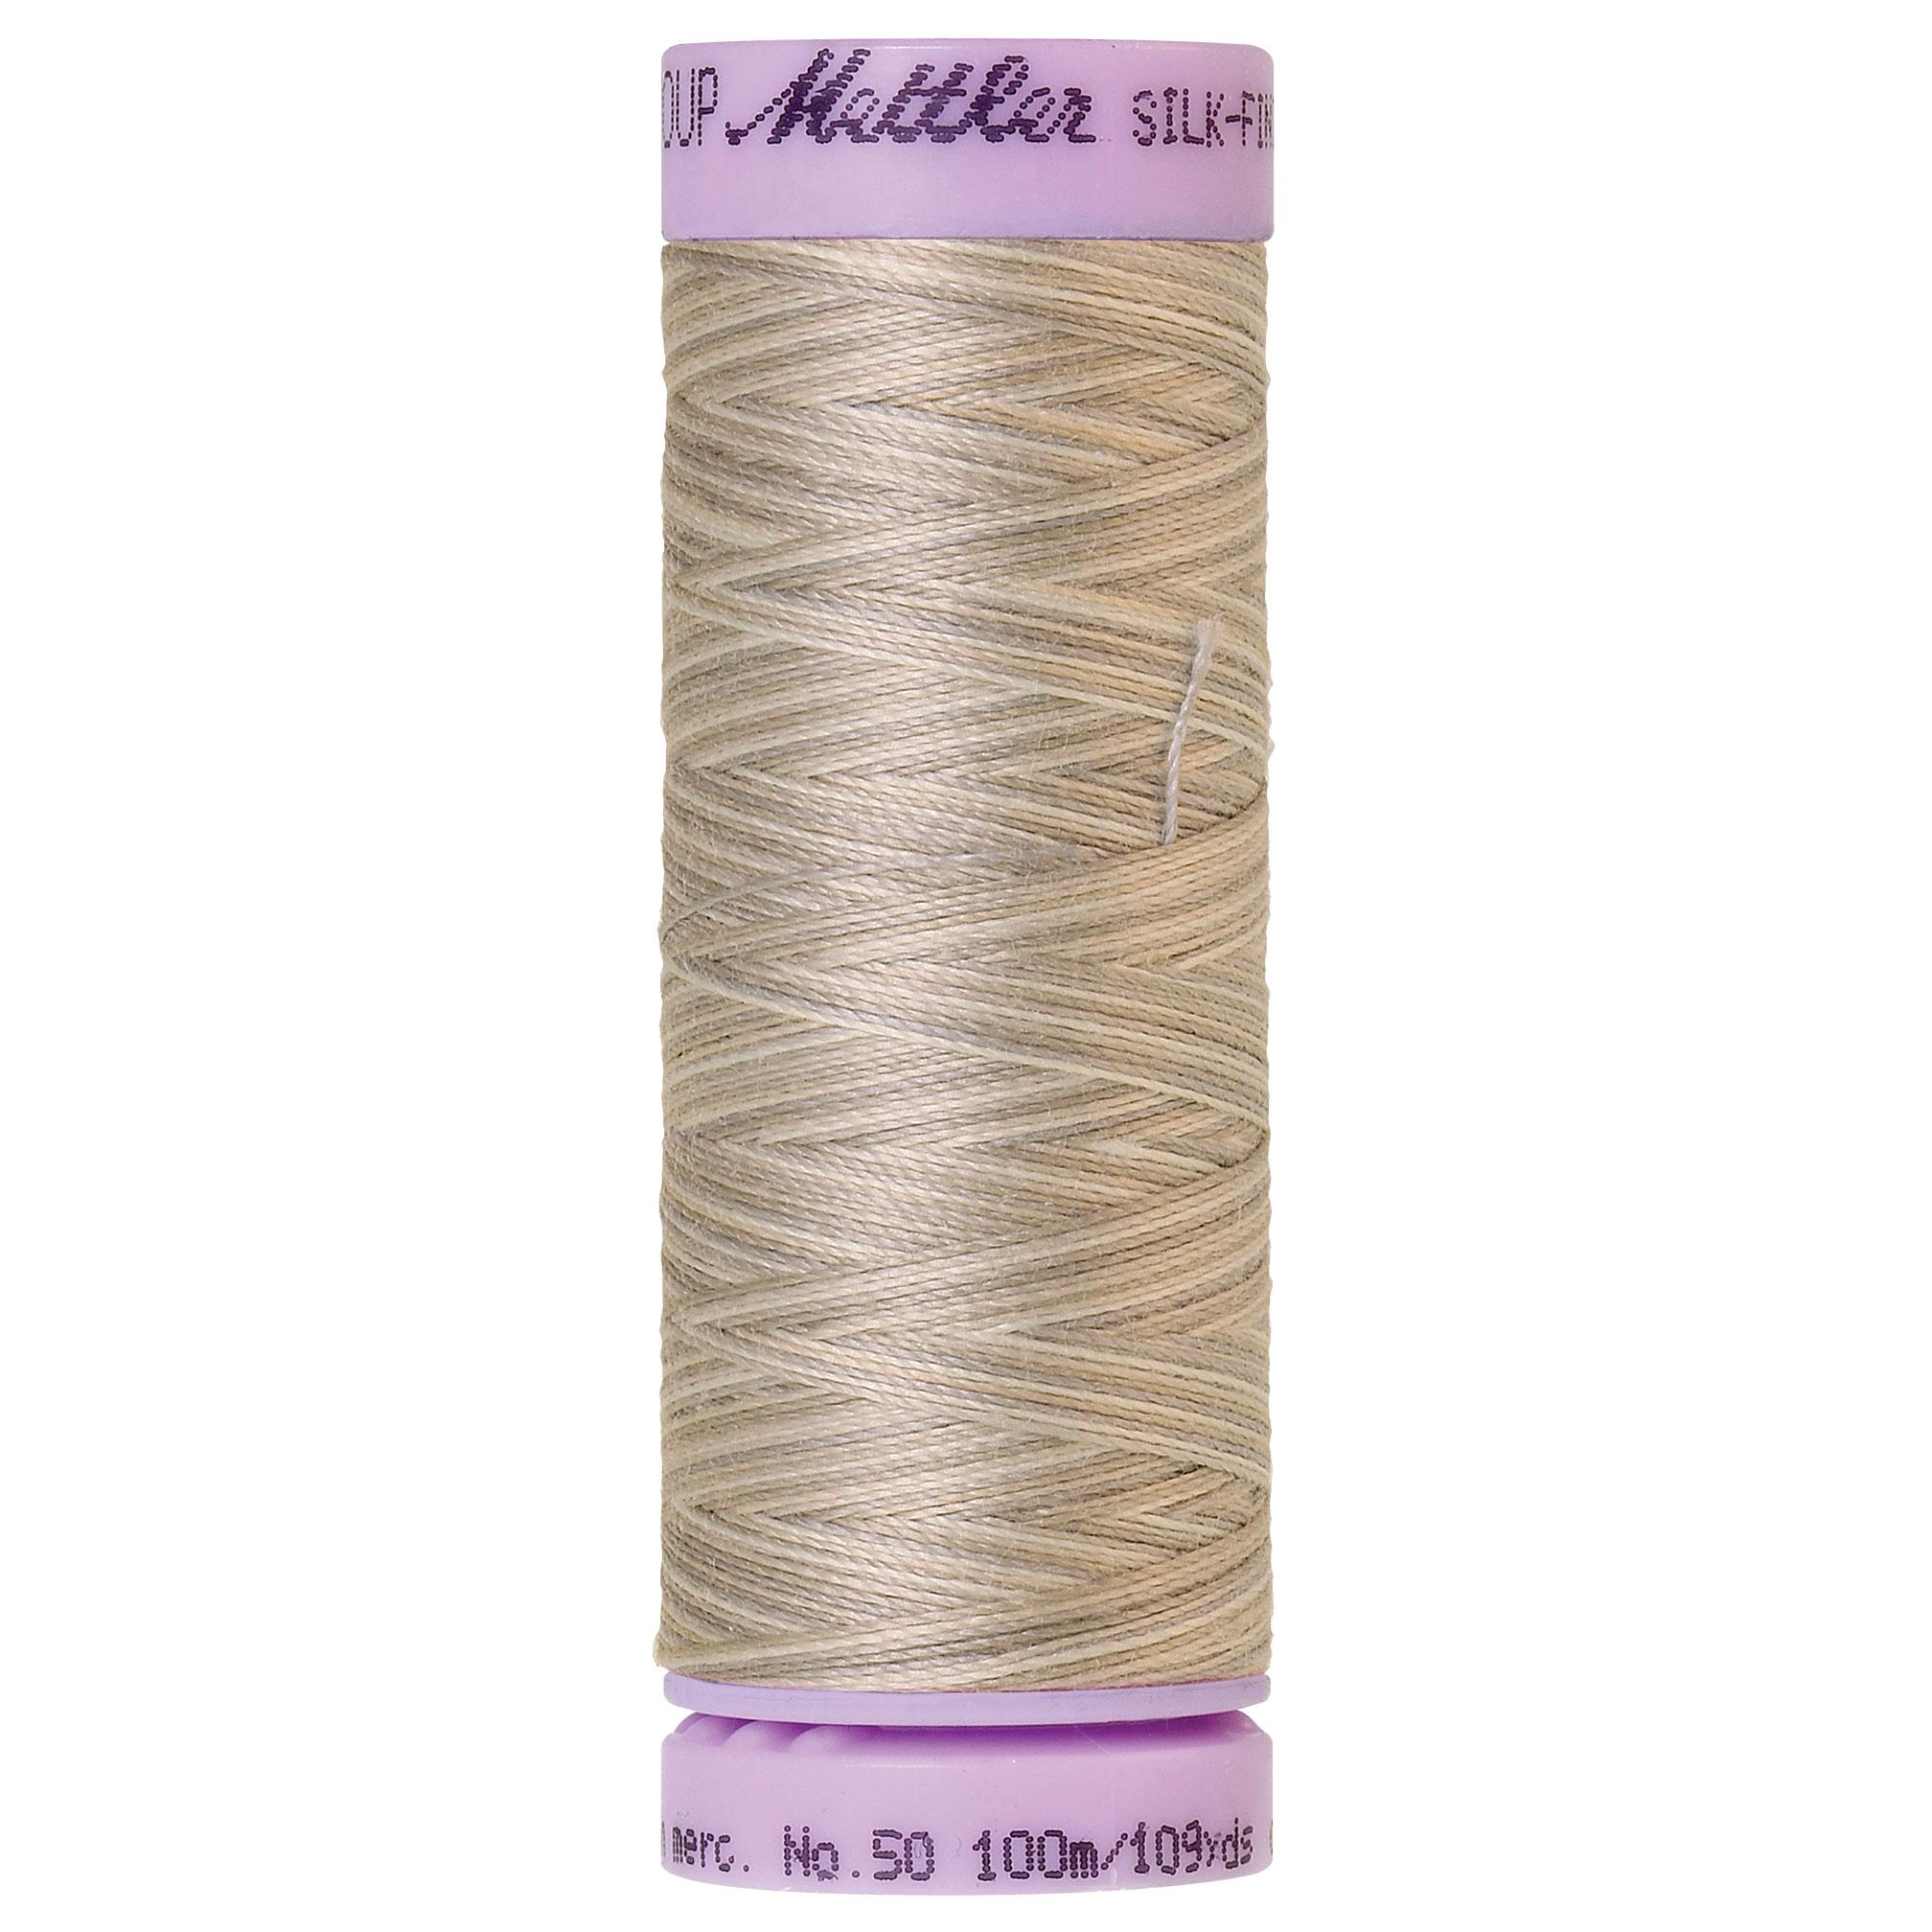 Silk Finish cotton 50wt 109 yards Dove Gray